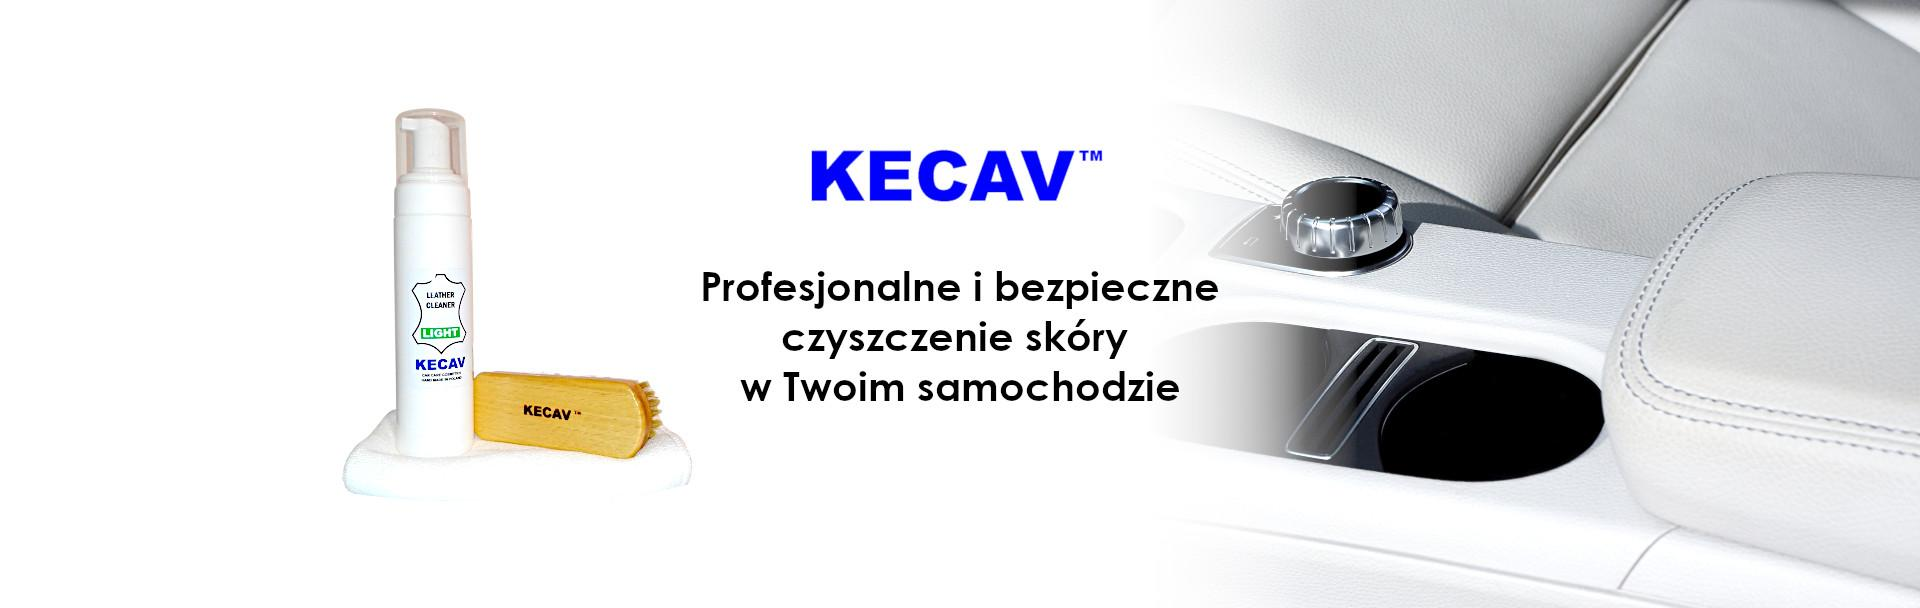 czysta-bryka kecav baner